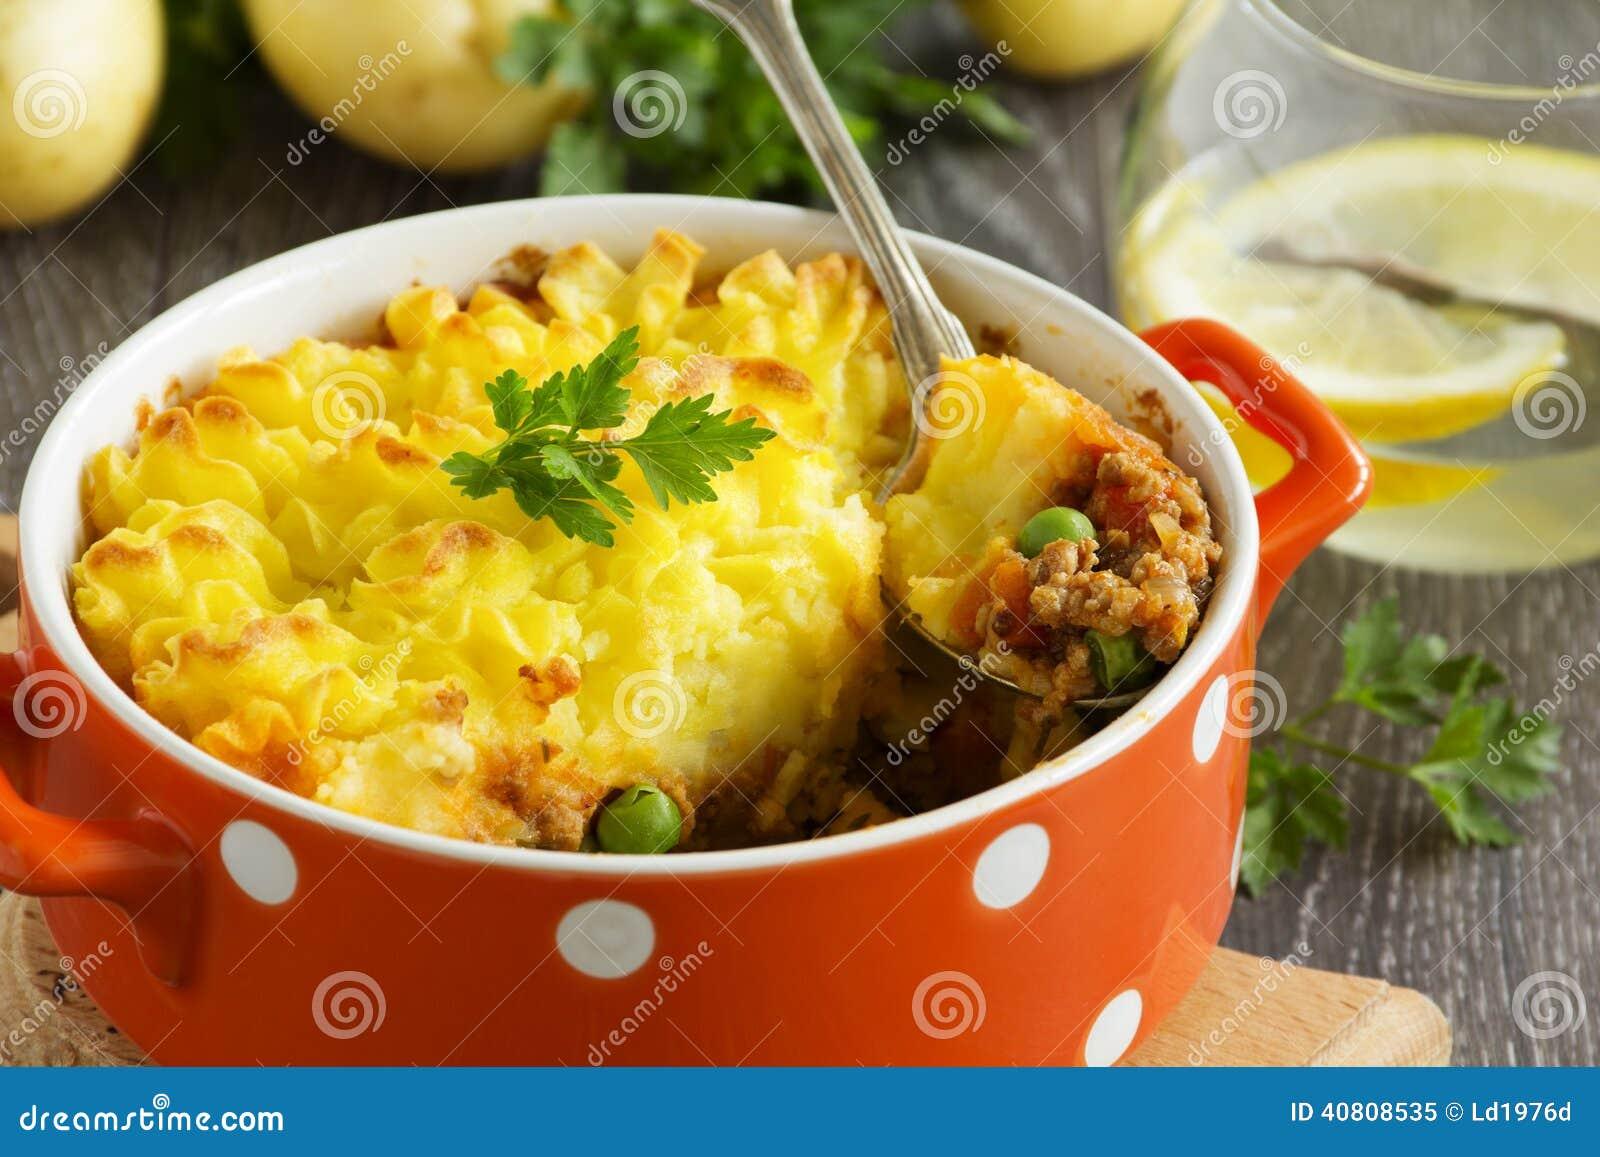 Hachis parmentier cuisine anglaise image stock image du for Anglaise cuisine